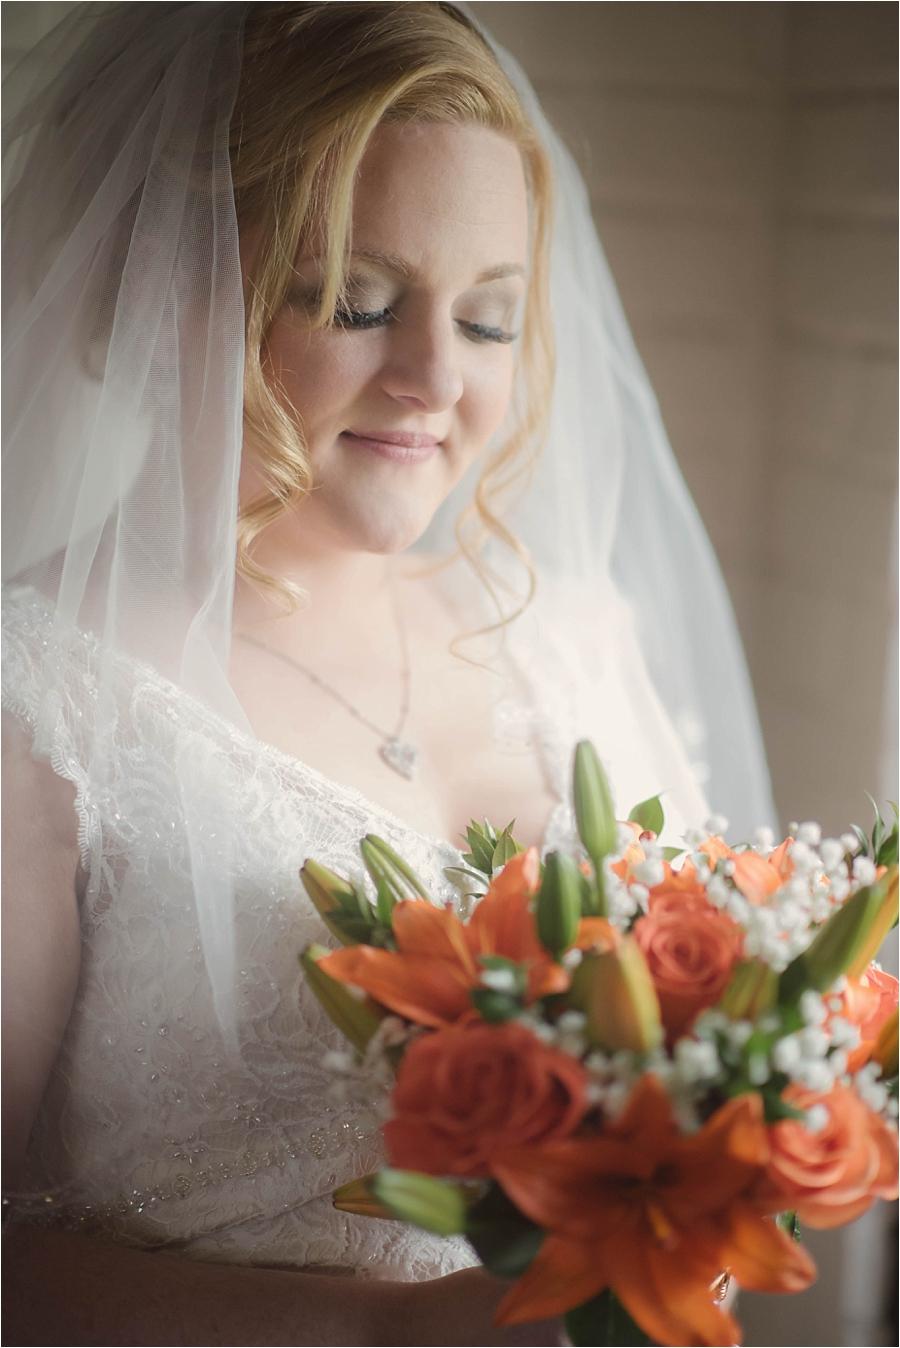 North-Park-Pittsburgh-Pennsylvania-Wedding-Photographer_0018.jpg